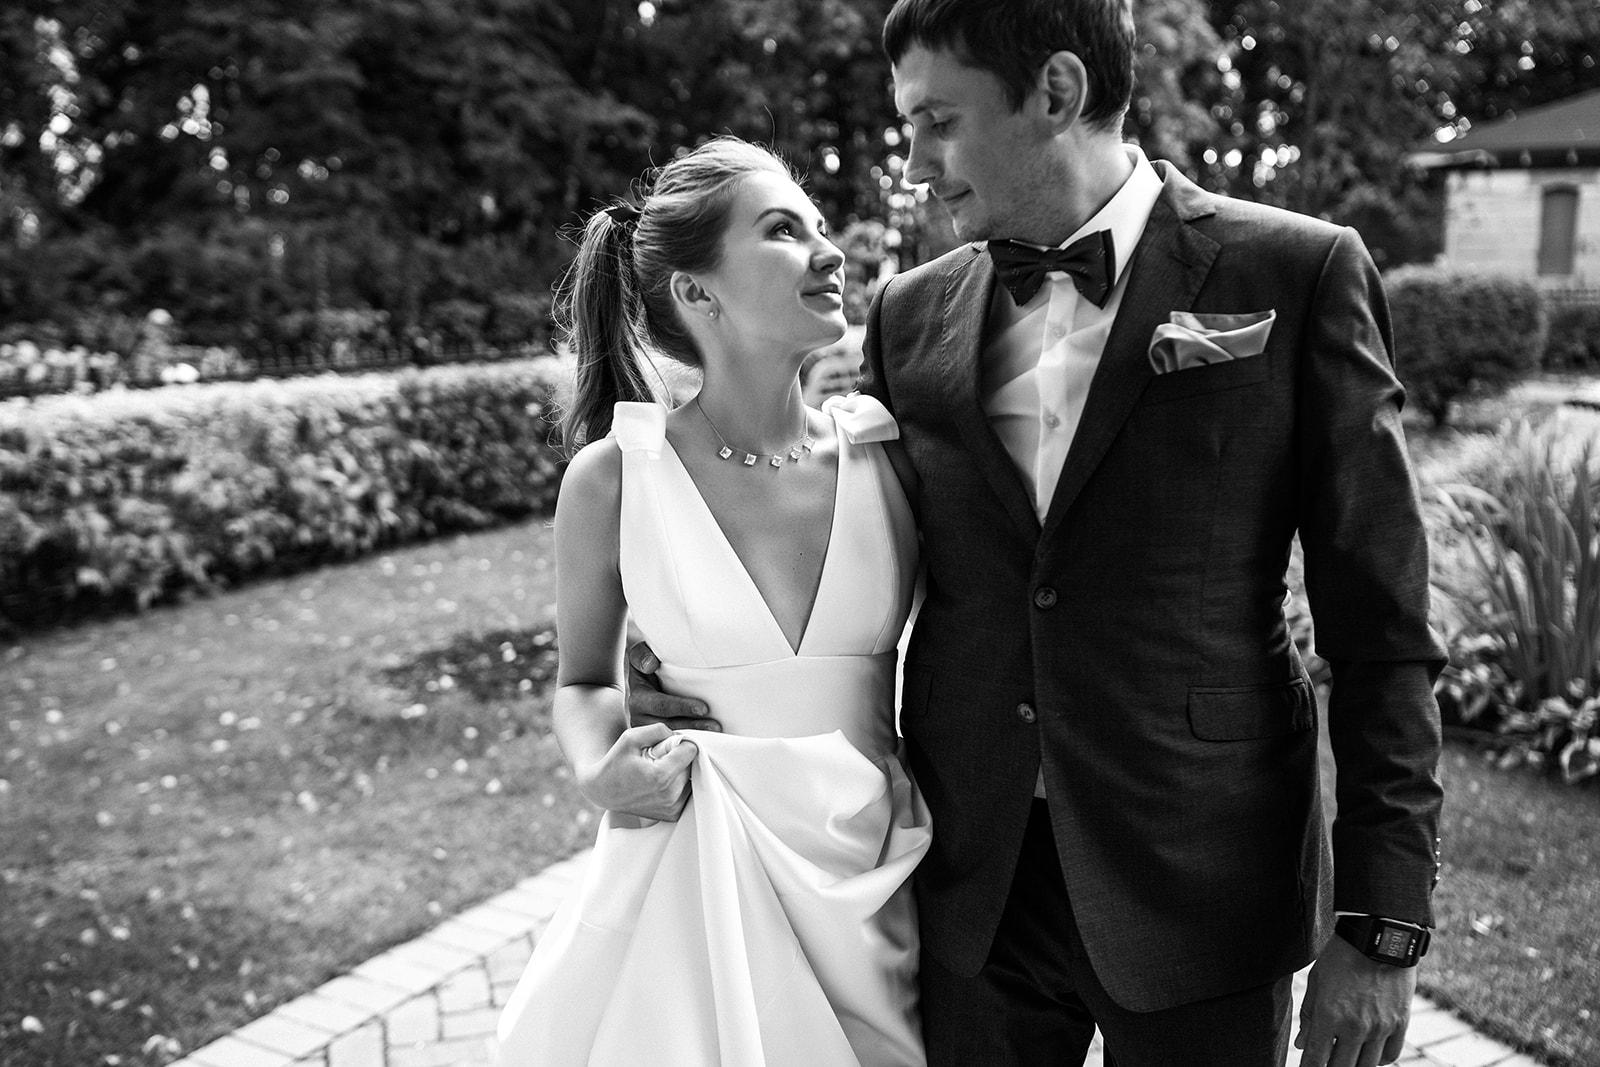 Свадьба в Жан-Реми. Фотограф Арсений Прусаков